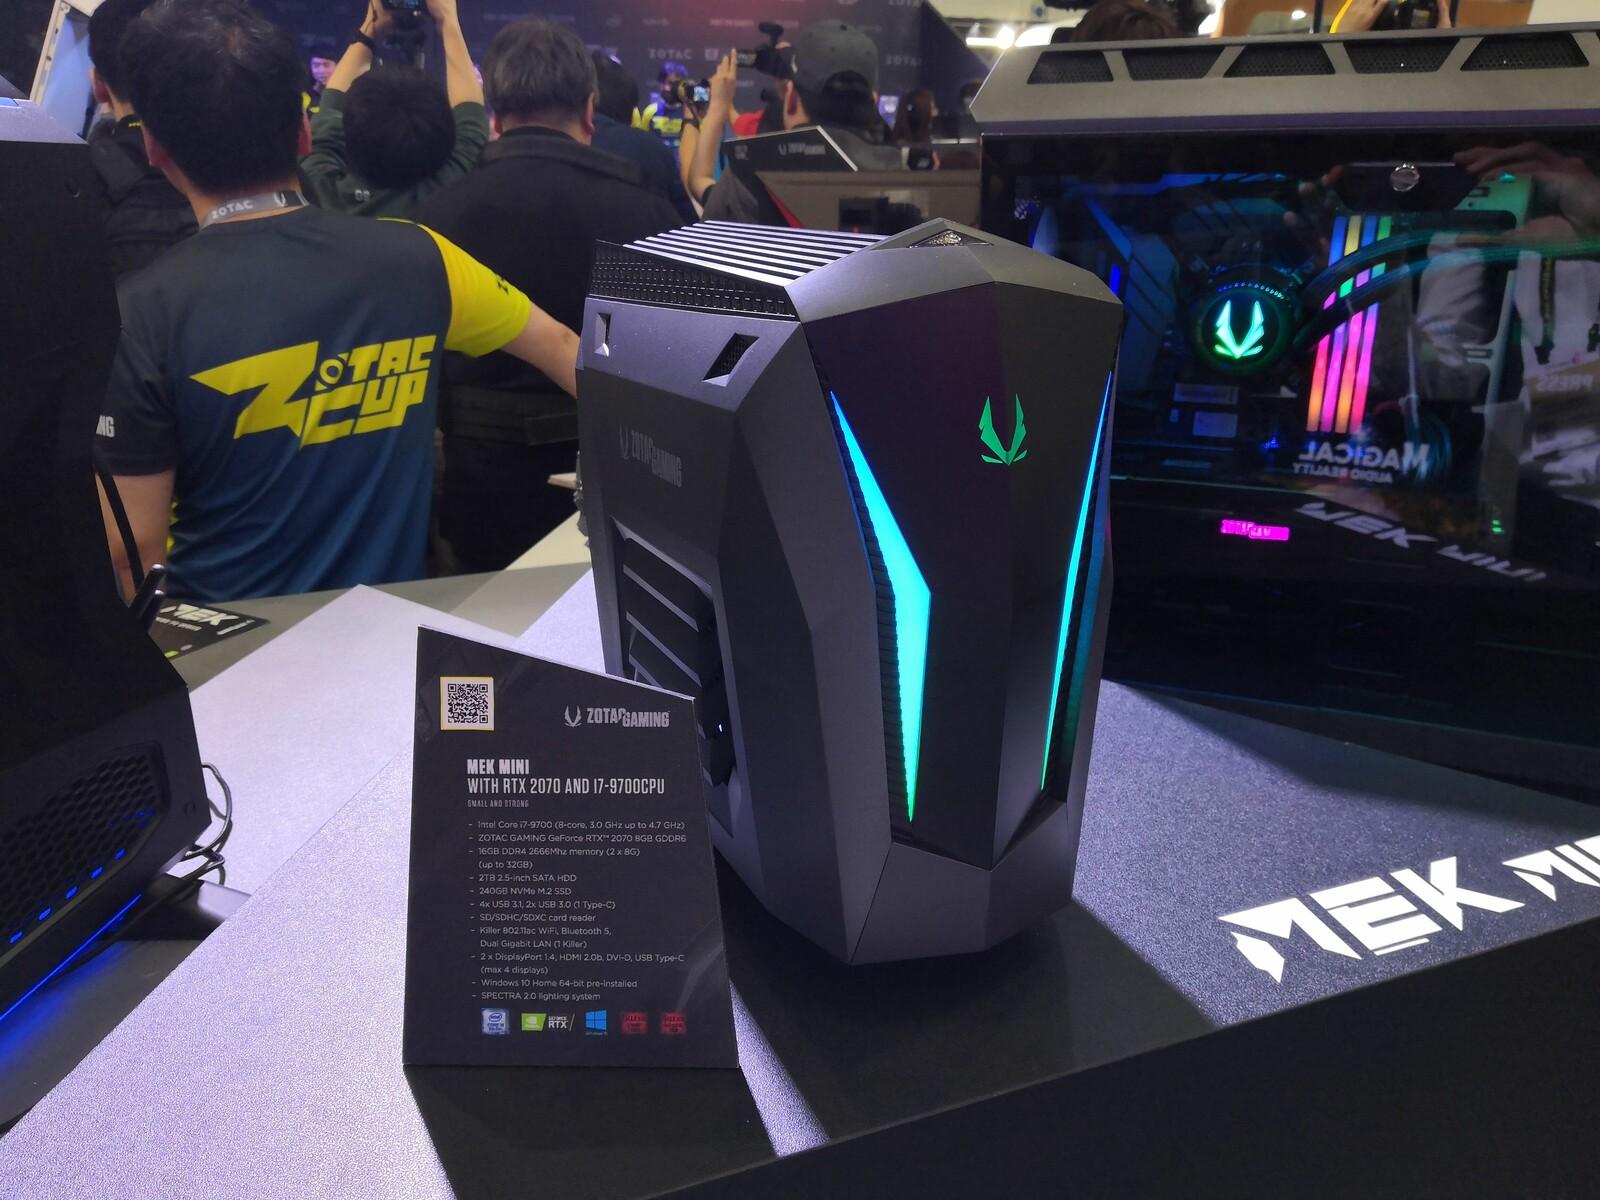 Zotac updates the MEK MINI gaming PC - NotebookCheck net News